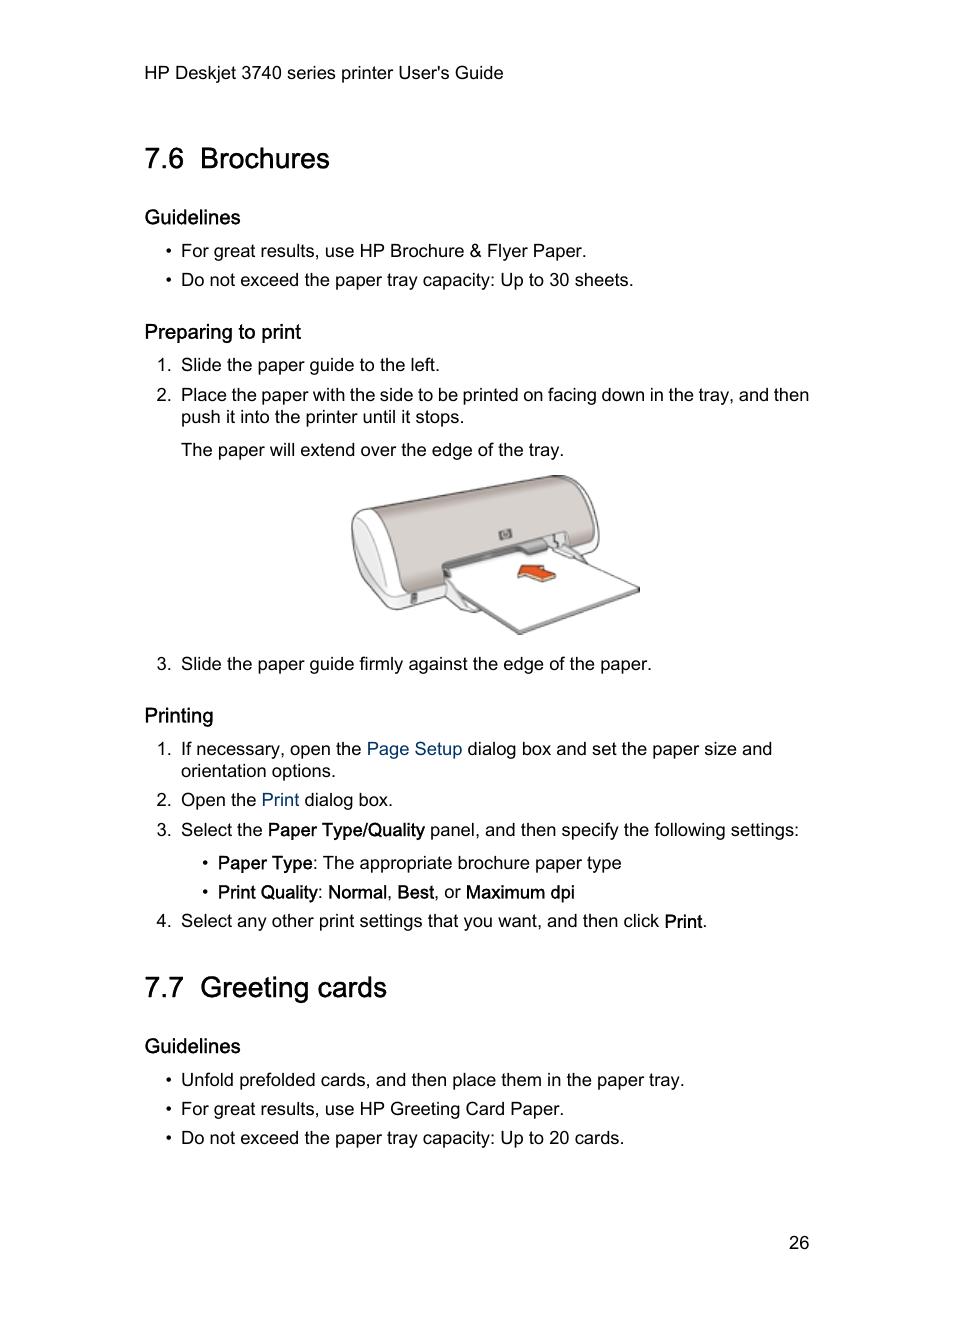 6 Brochures Guidelines Preparing To Print Hp Deskjet 3745 Color